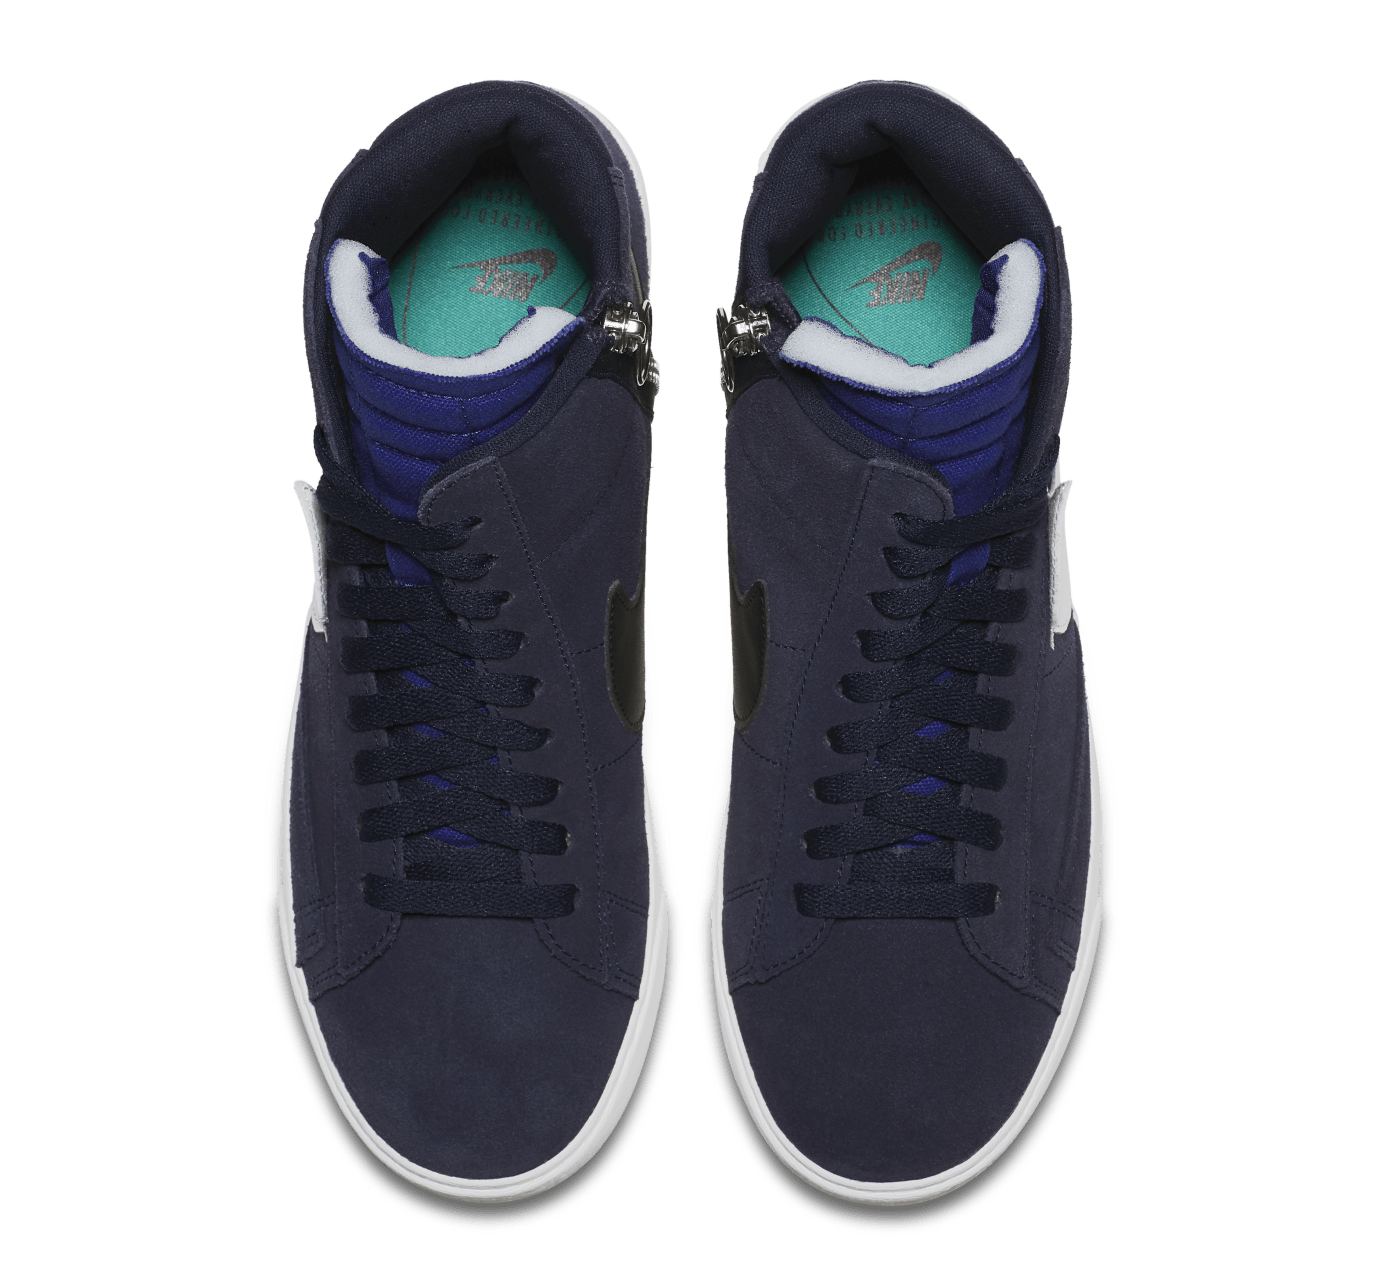 Nike WMNS Blazer Rebel 'Blackened Blue' BQ4022-401 (Top)